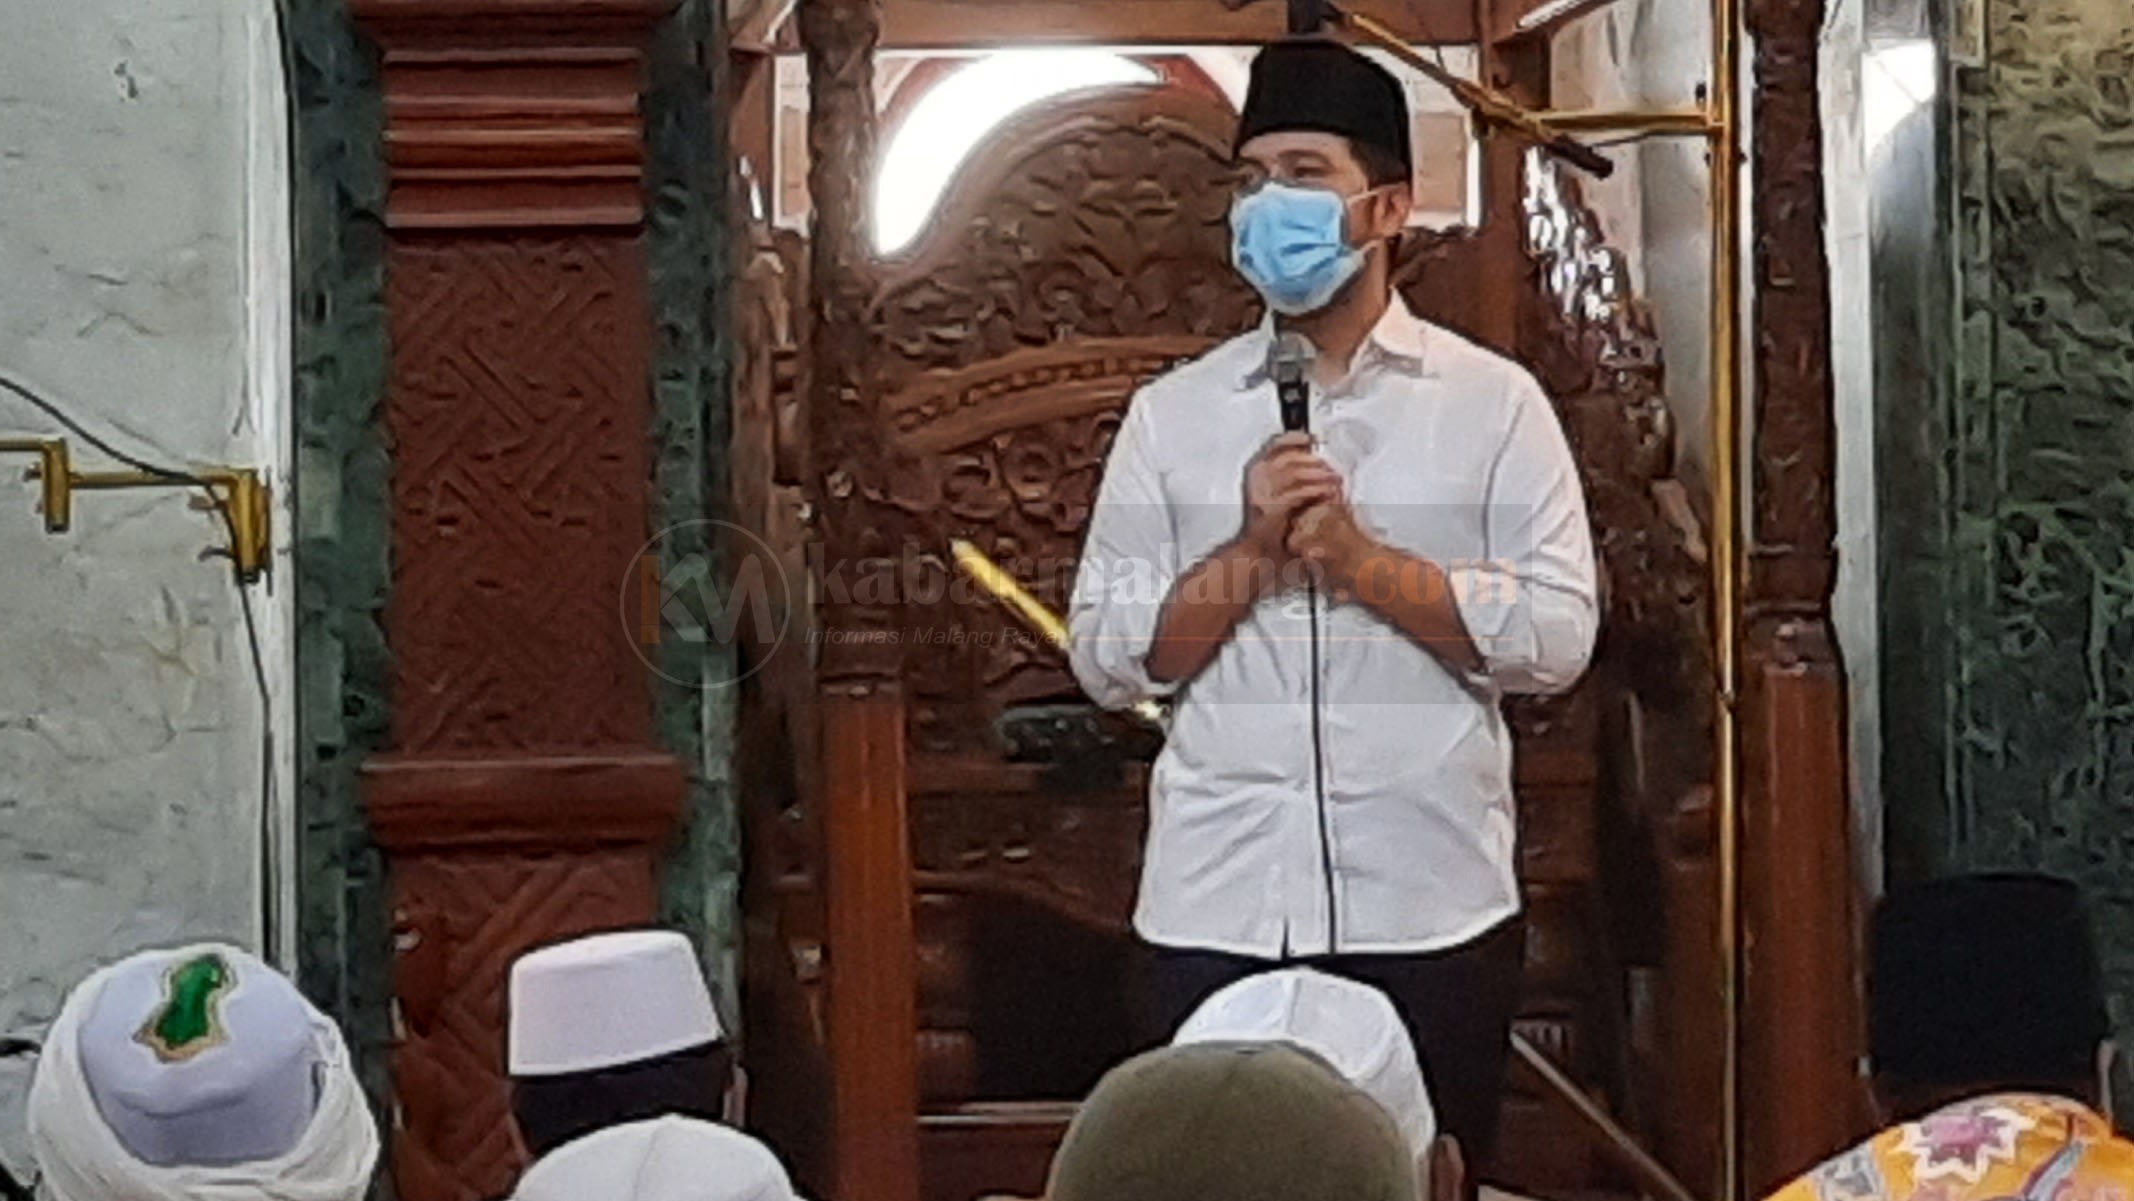 Emil Dardak Wagub Jatim Ungkap Alasan Perpanjangan PPKM